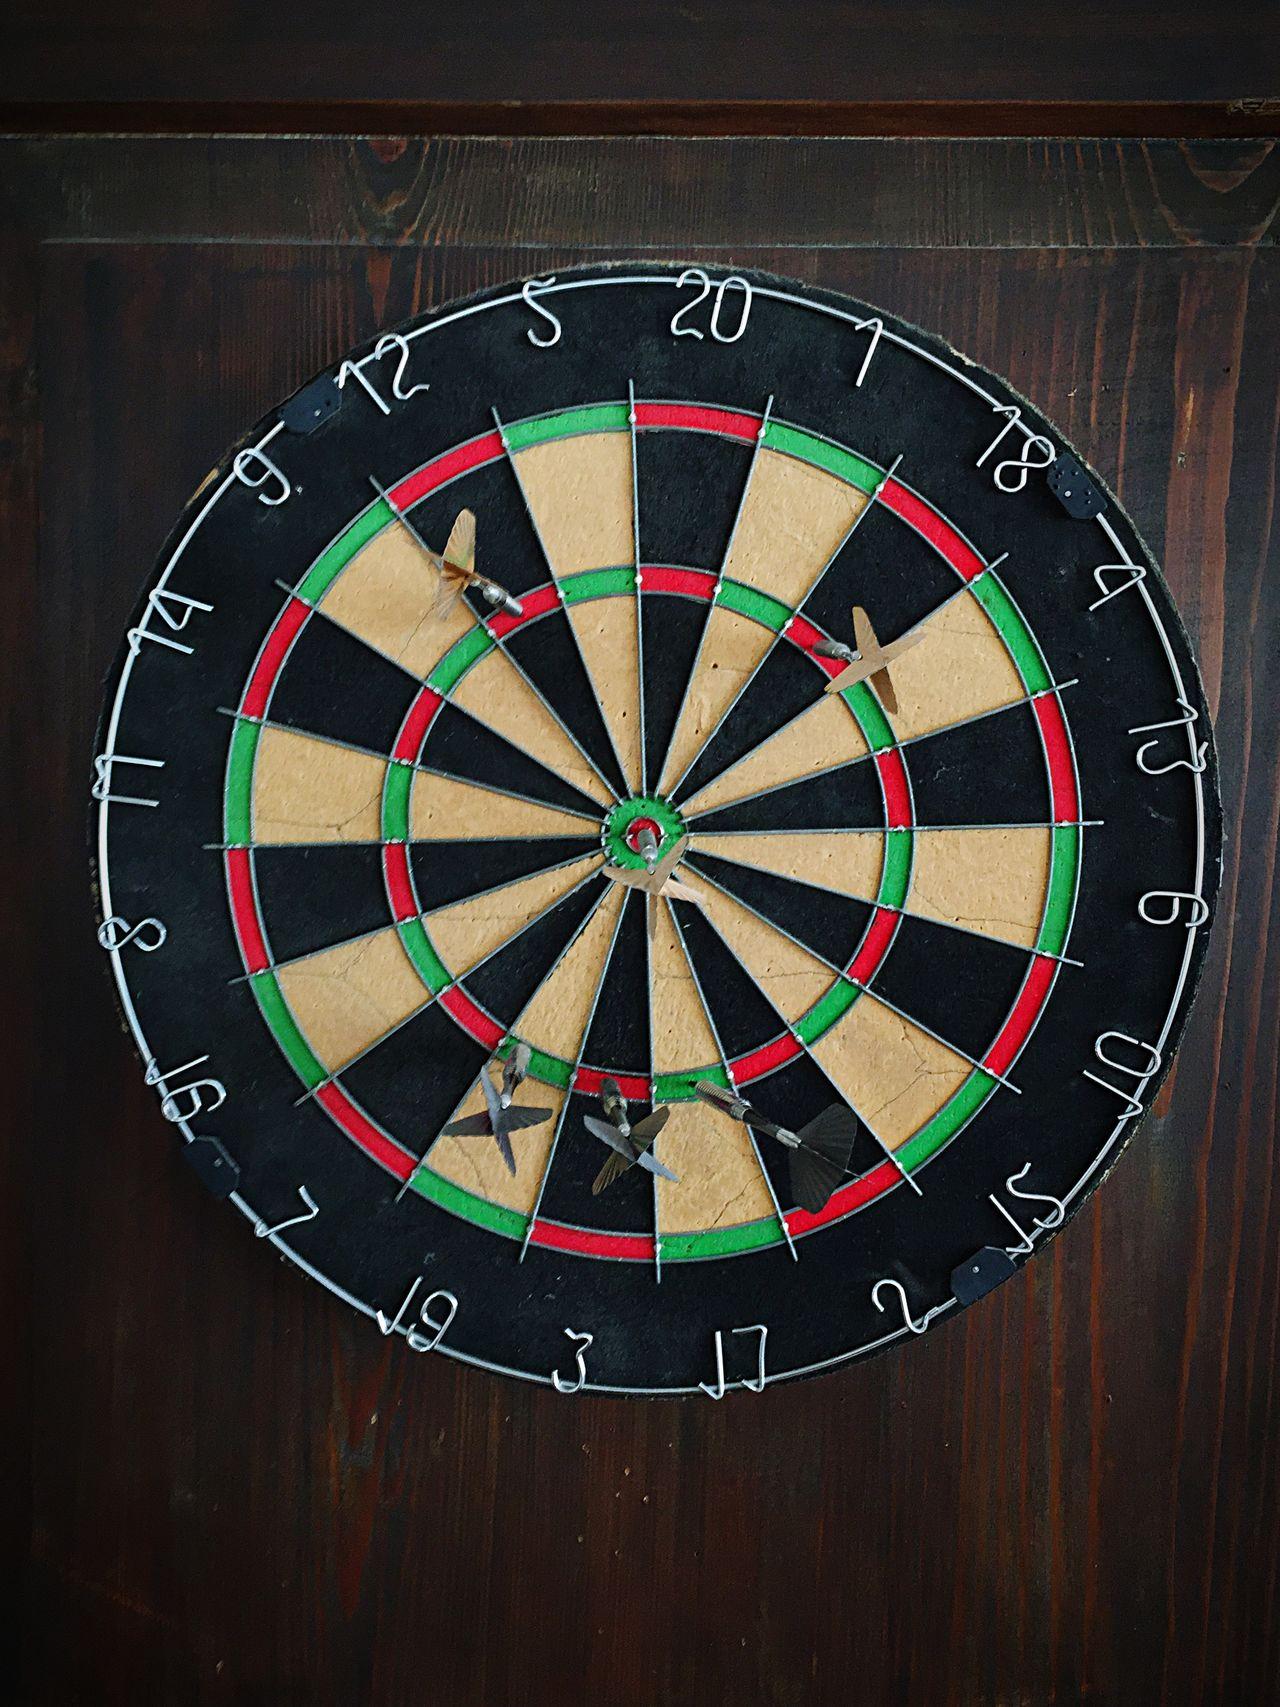 Ziel Target Darts Aim Bang On Target